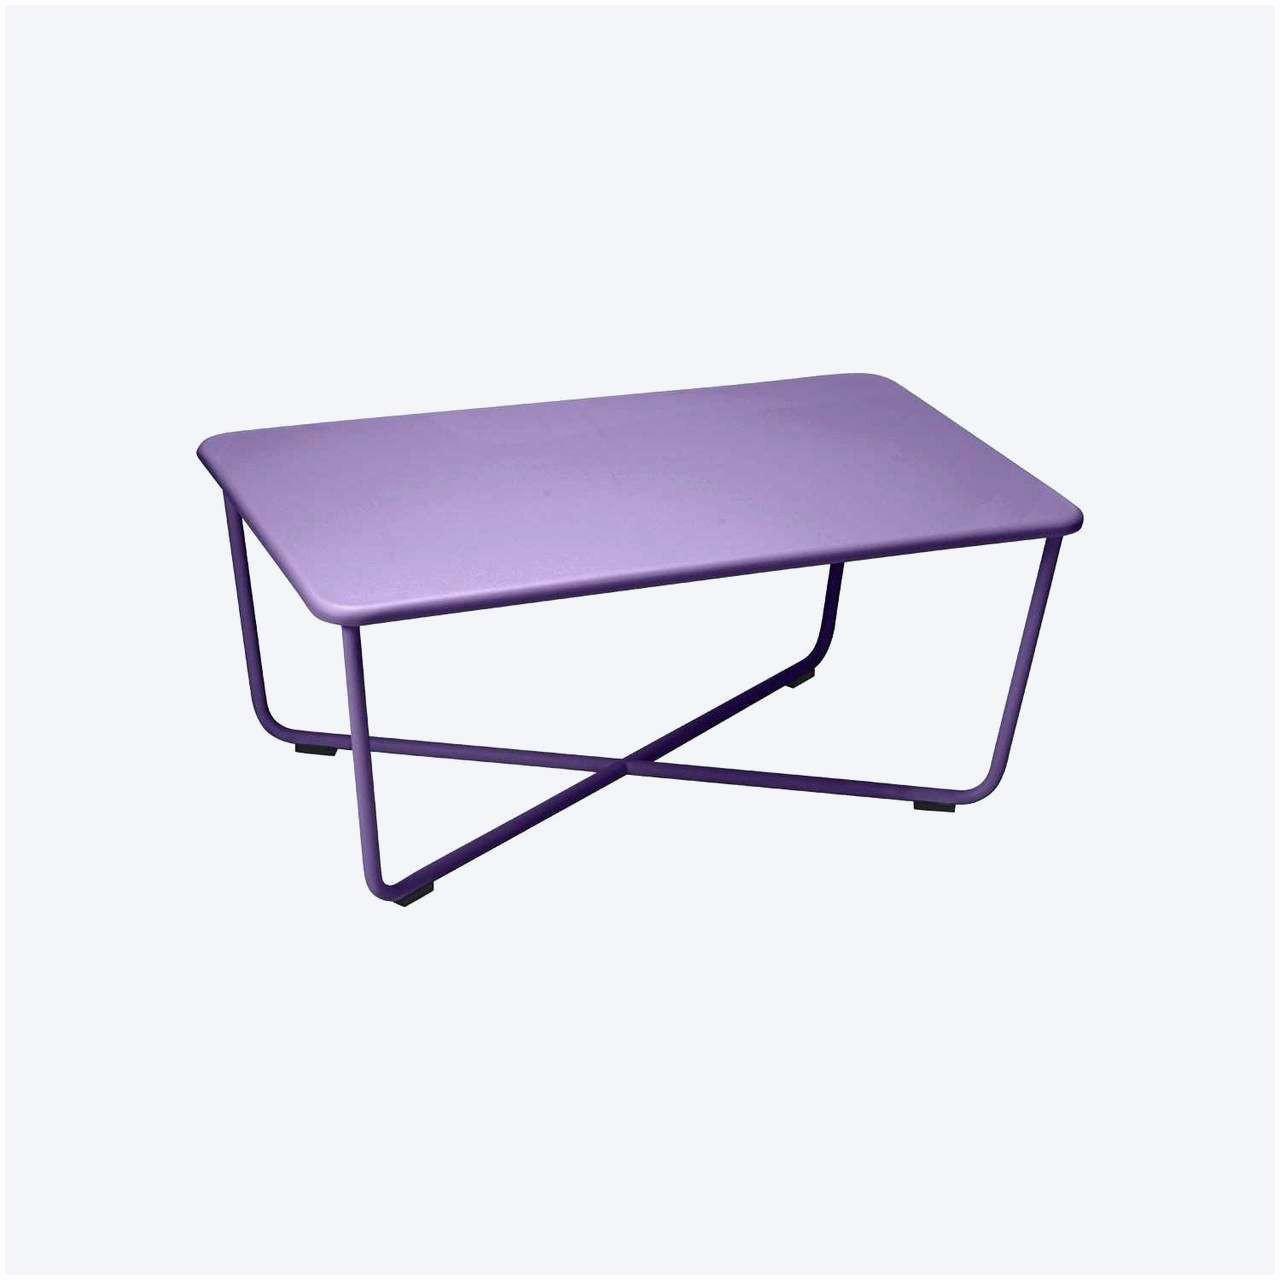 table basse fermob charmant source d inspiration frais banquette basse luxe banquette basse 0d of table basse fermob 1